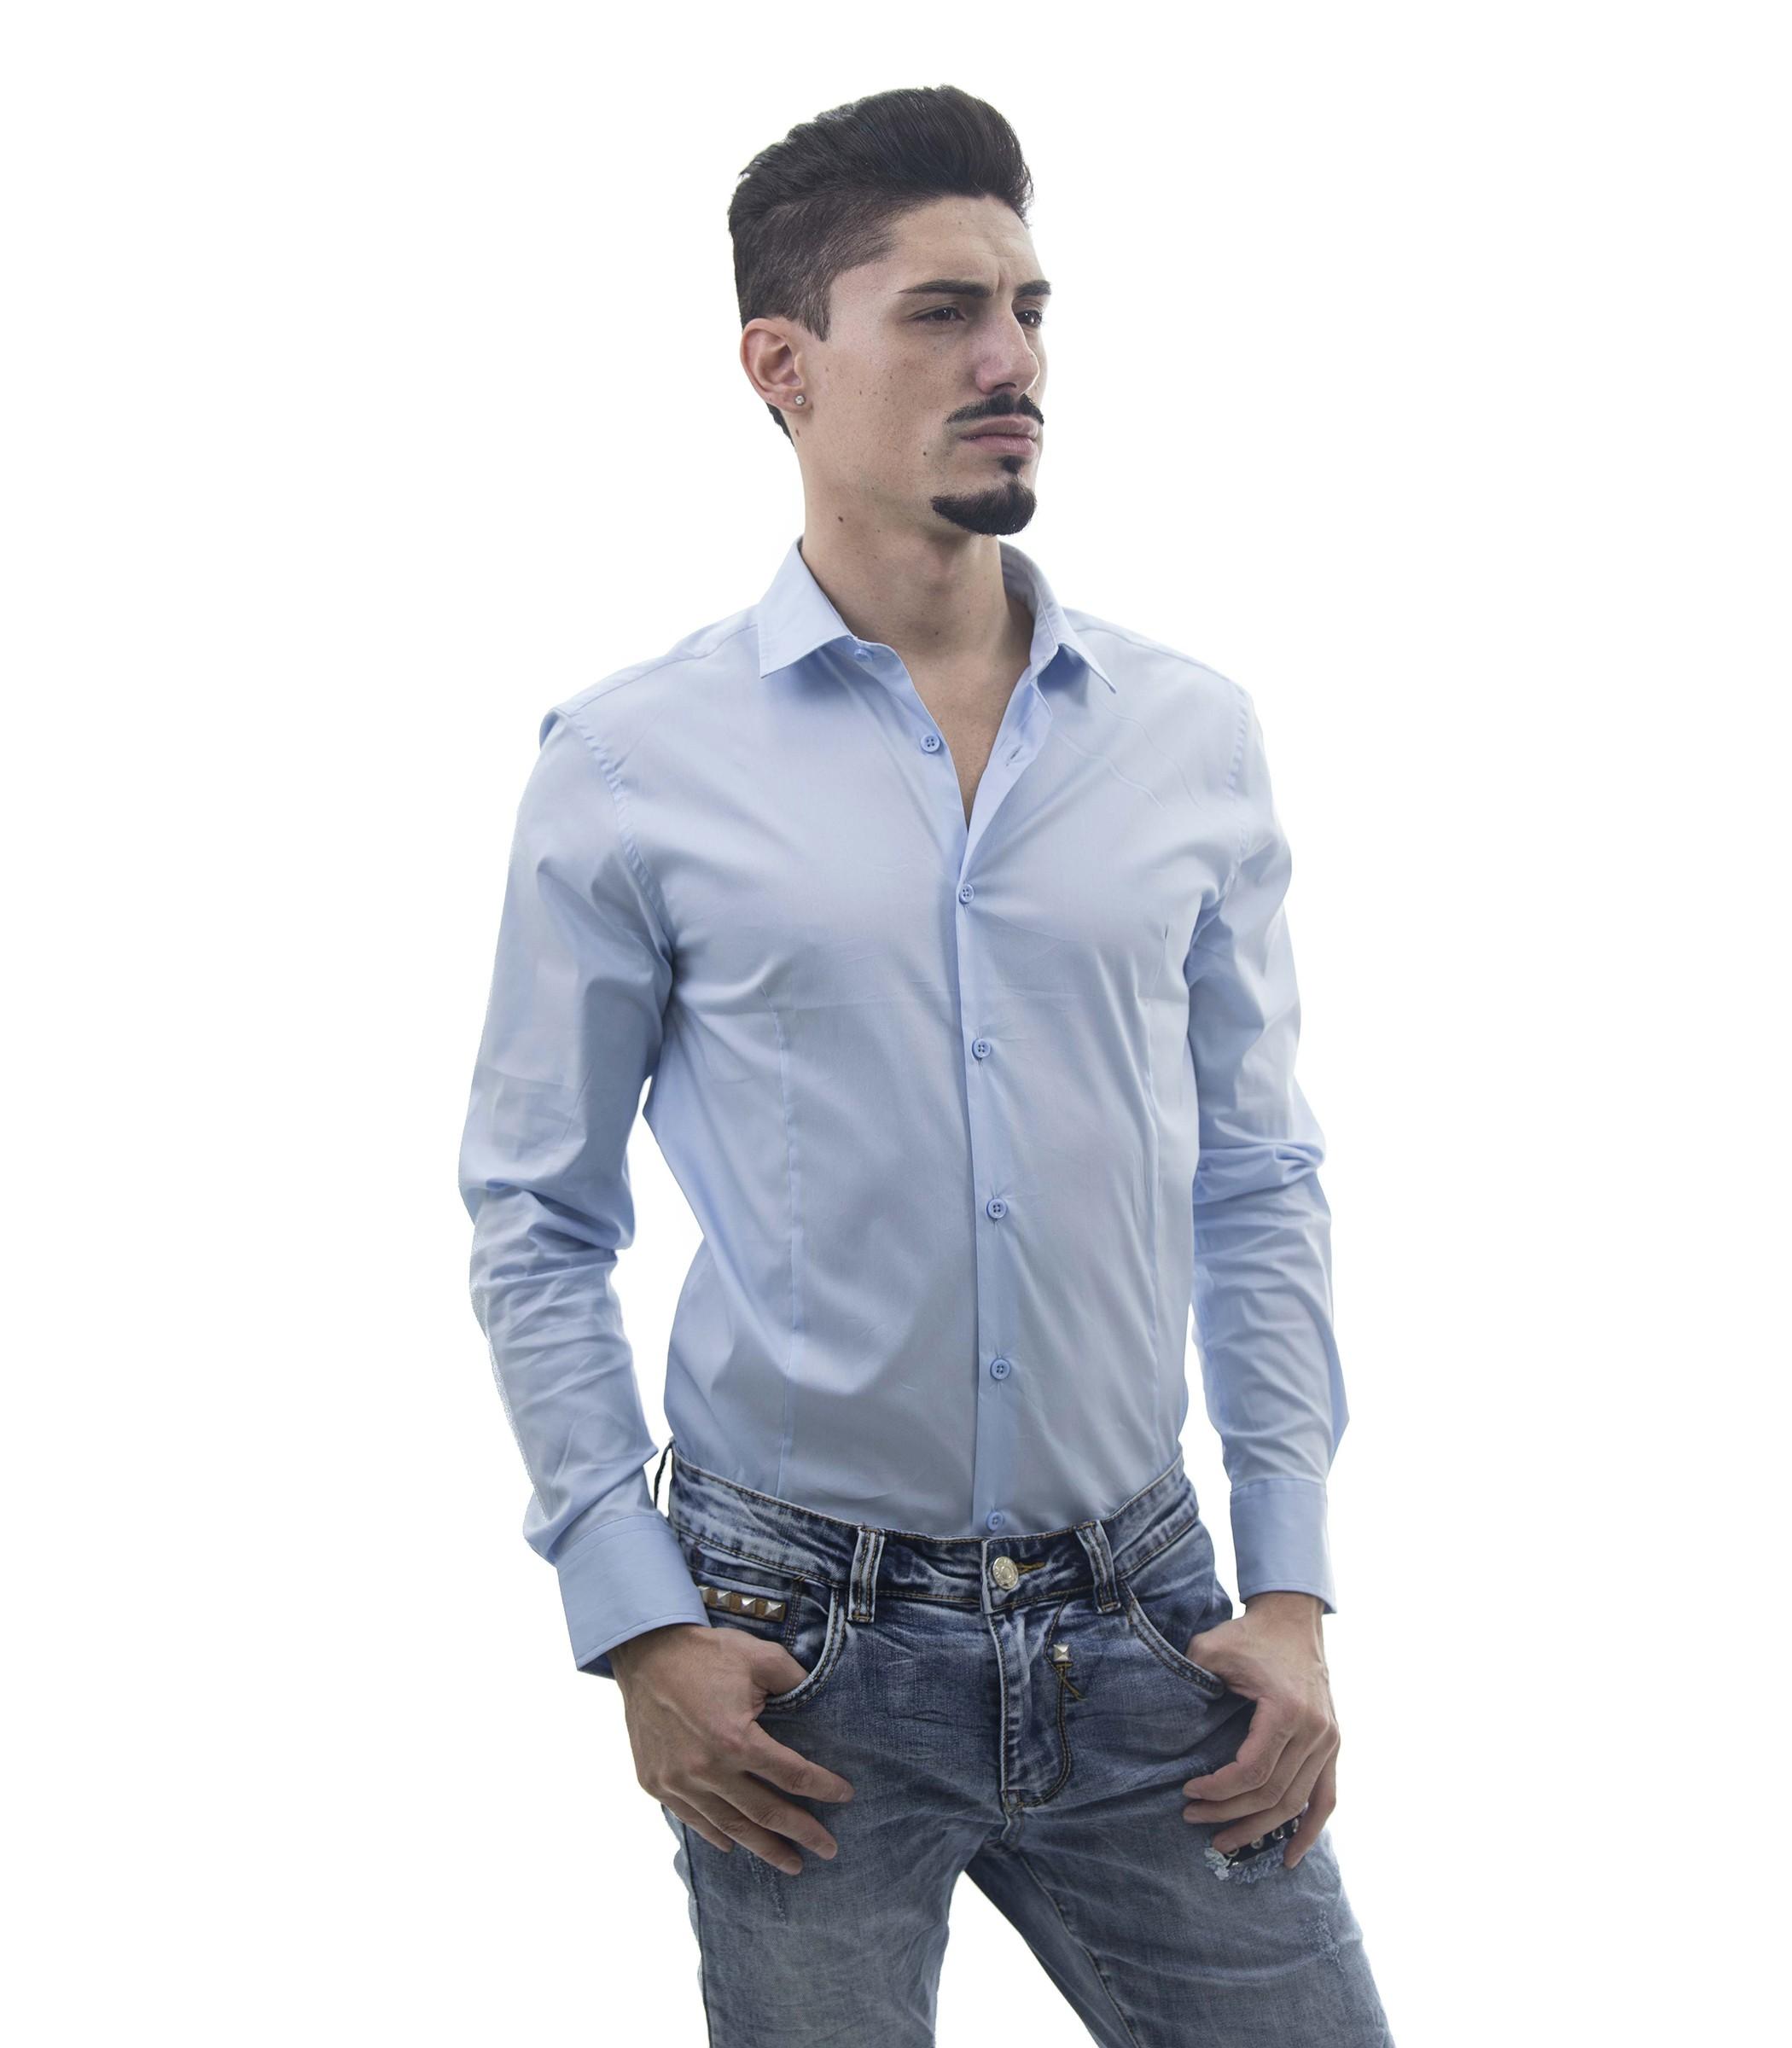 Camicie Spalle Spalle Uomo Camicie Slim Slim Spalle Slim Uomo Camicie RL54jA